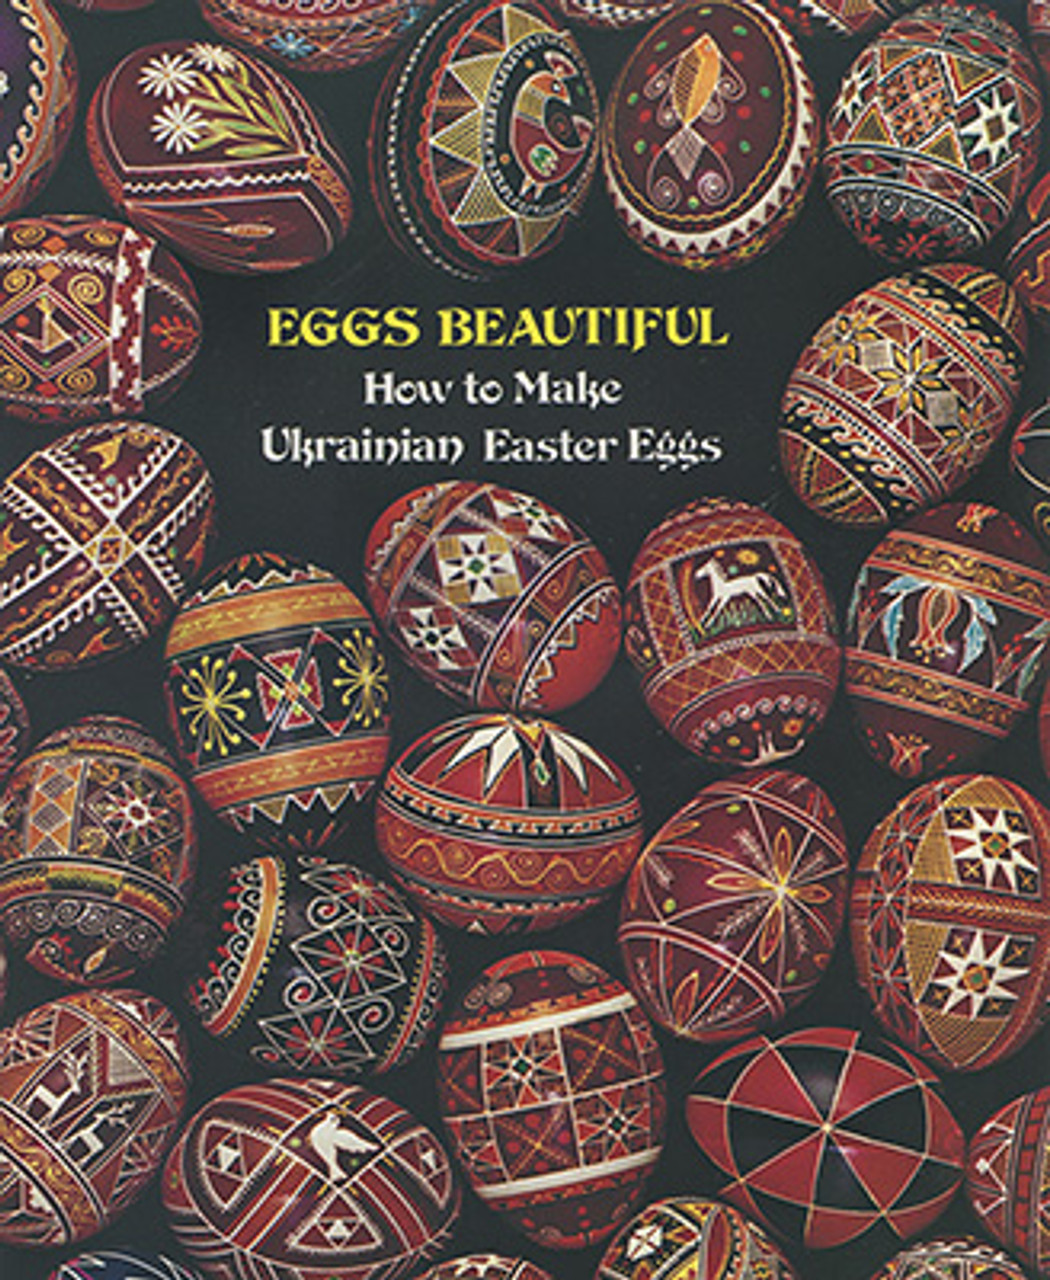 Eggs Beautiful, How to Make Ukrainian Easter Eggs